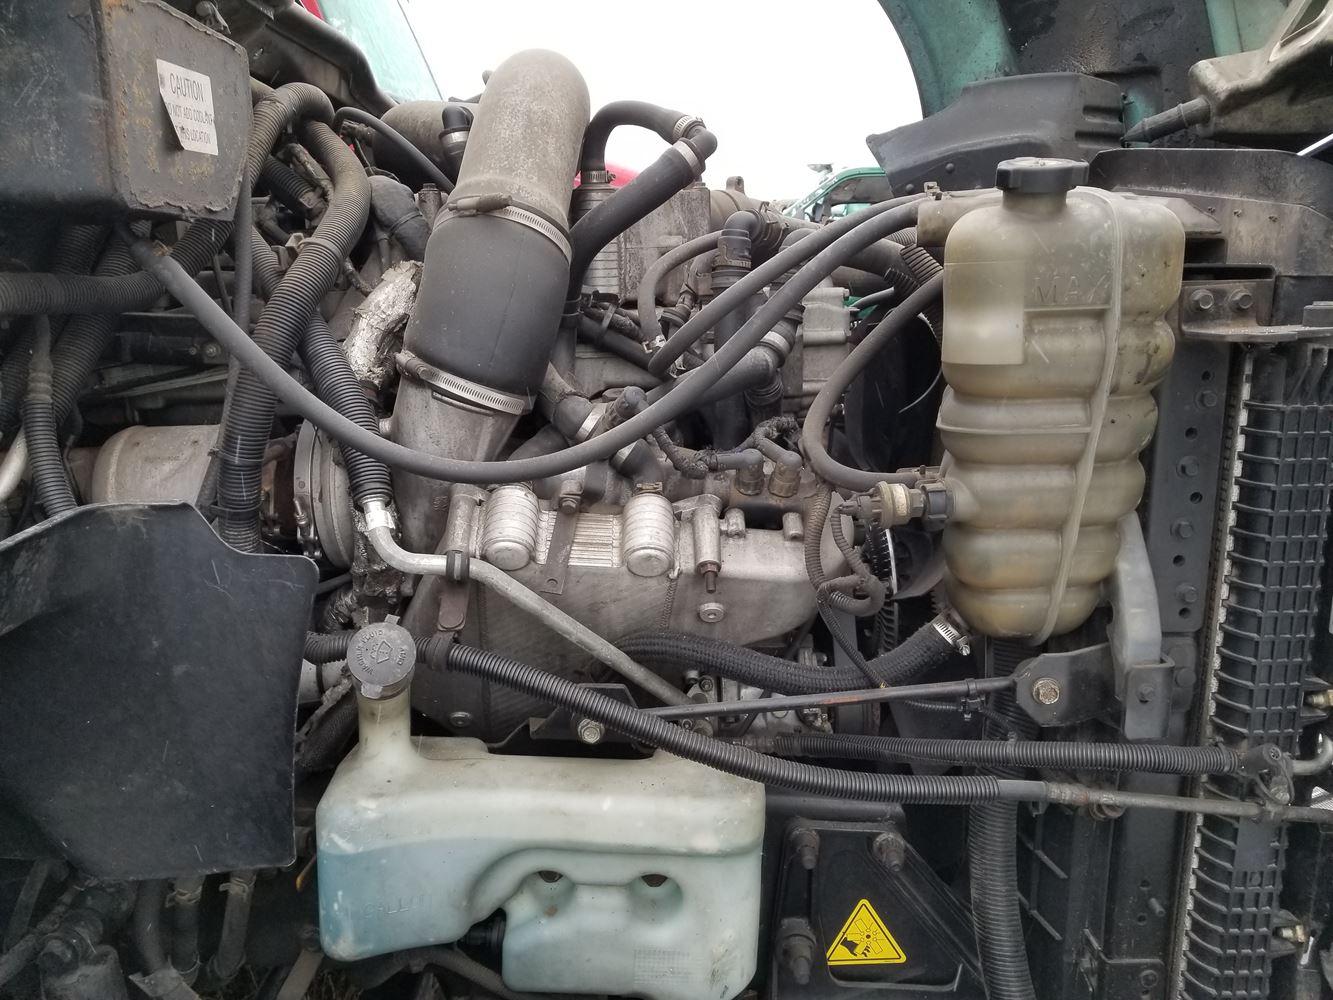 C Lg besides International Maxxforce Engine Assys Guc Zhpqhcgk F furthermore  further No Start moreover . on international dt466 oil pressure sensor location